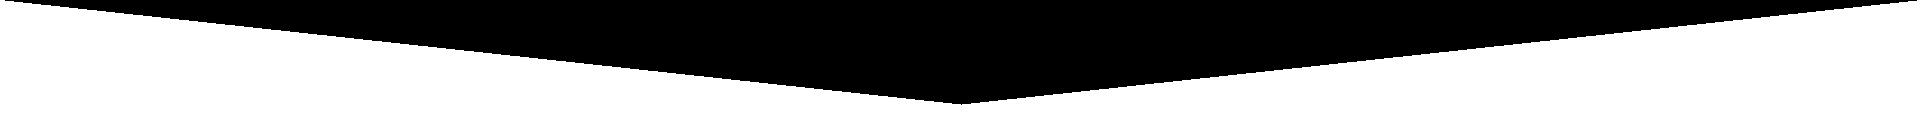 skew-slider